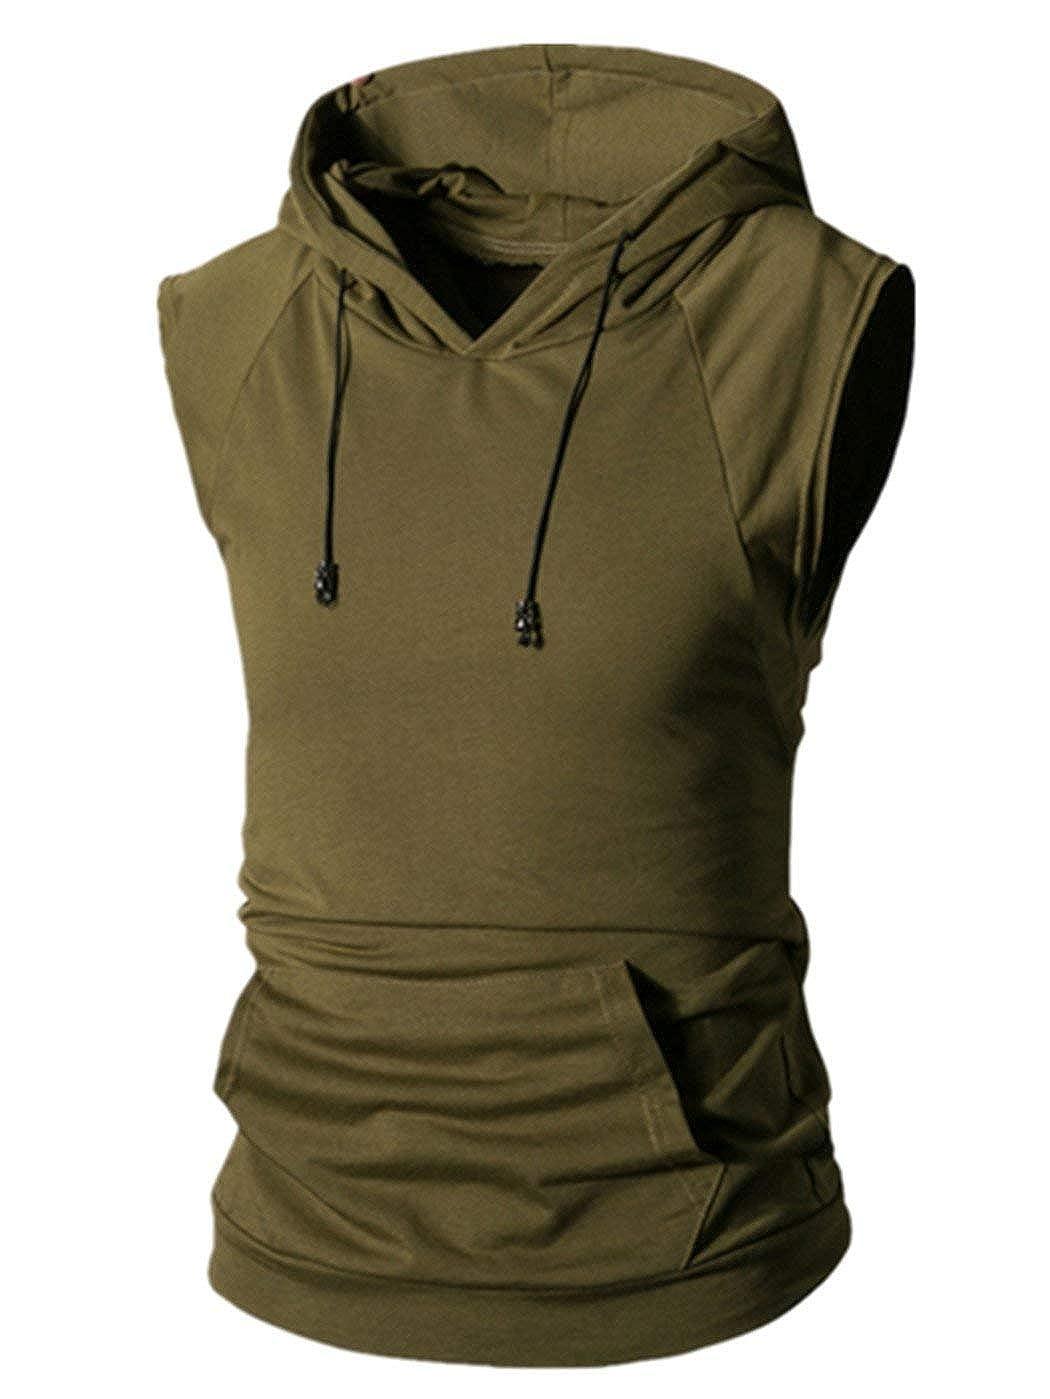 8984b8eda33 Lelili Men Summer Sports Hoodie Tank Tops Fashion Solid Kangaroo Pocket  Drawstring Hooed Pullover Shirt Blouse at Amazon Men s Clothing store